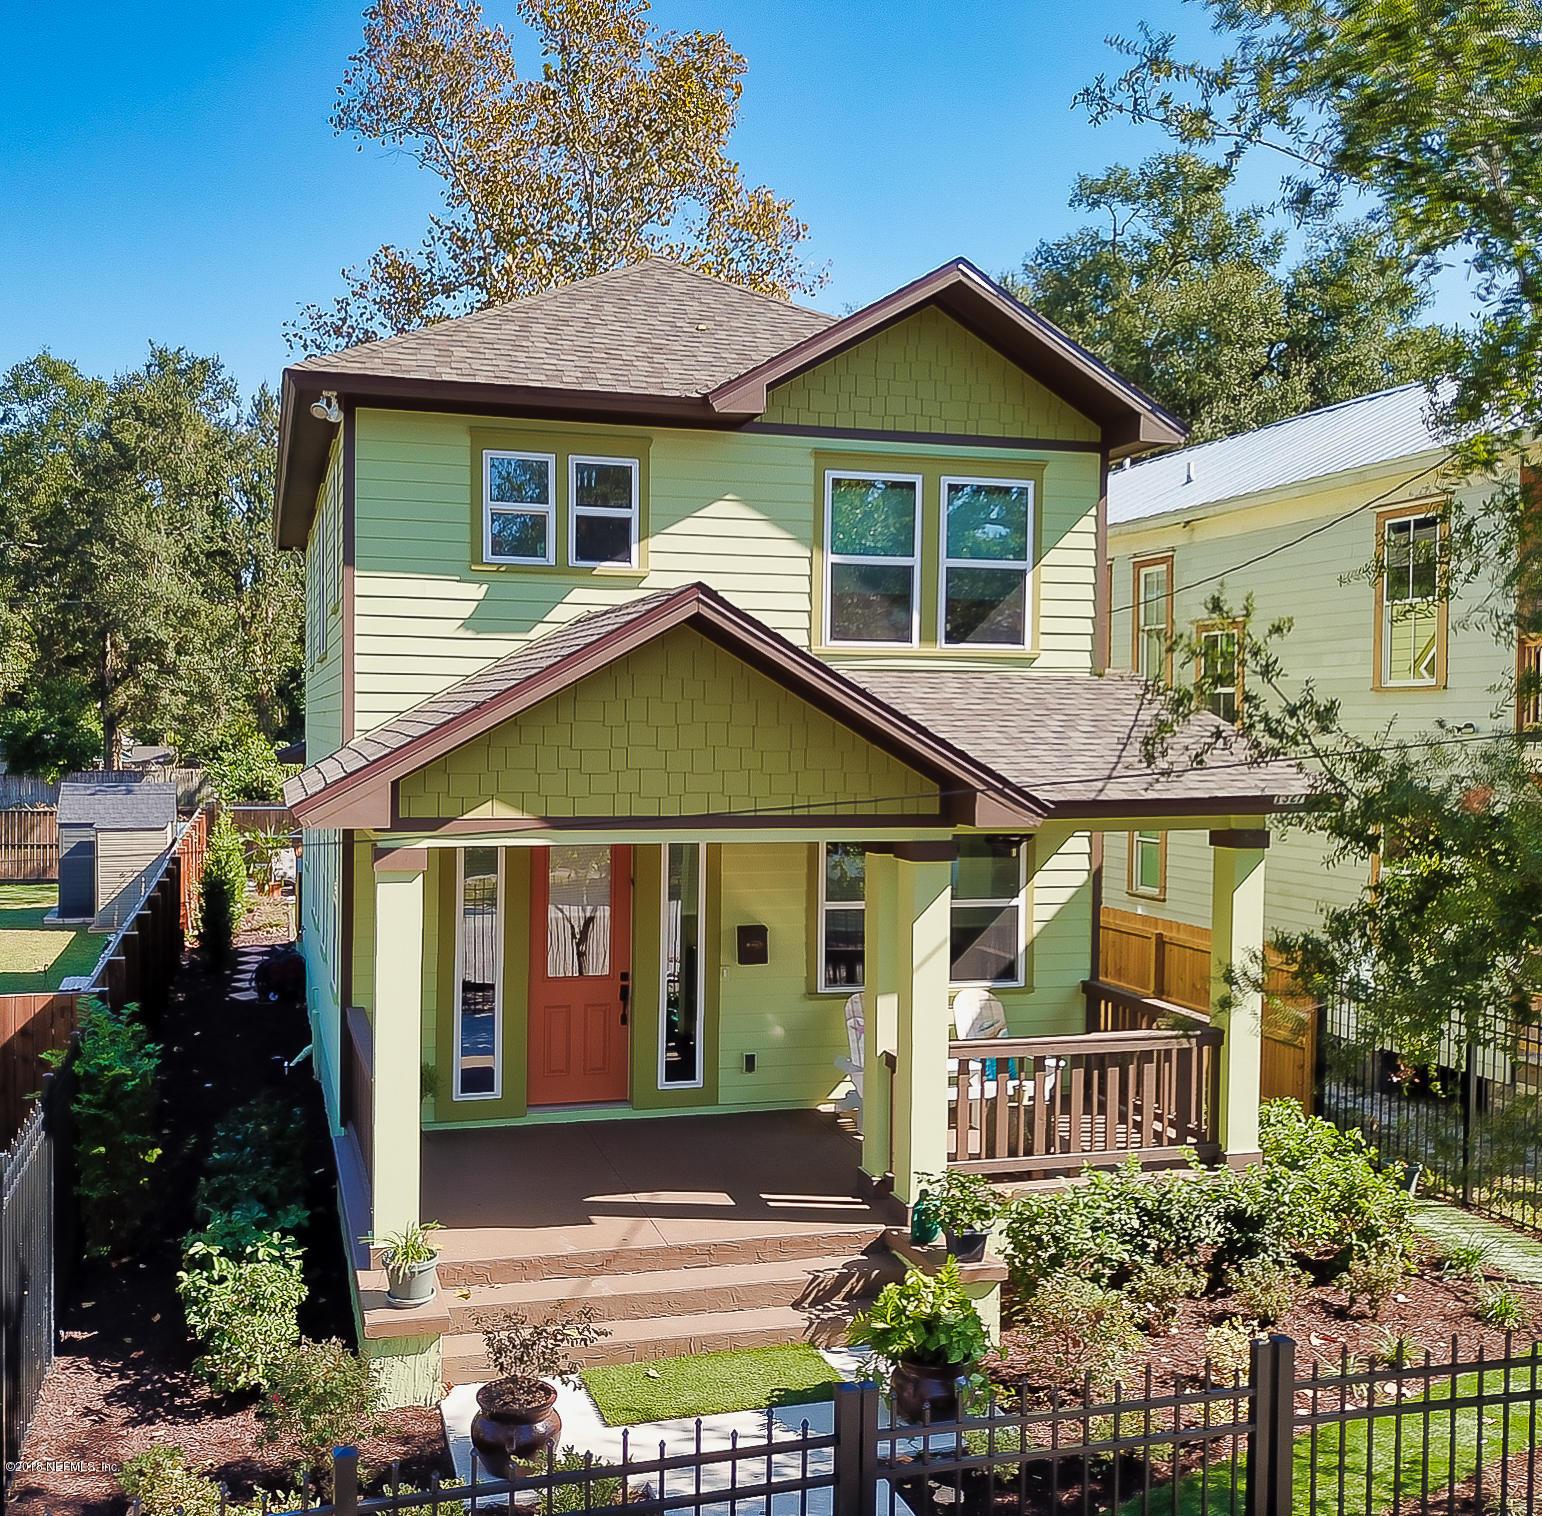 1327 WALNUT, JACKSONVILLE, FLORIDA 32206, 3 Bedrooms Bedrooms, ,3 BathroomsBathrooms,Residential - single family,For sale,WALNUT,964922